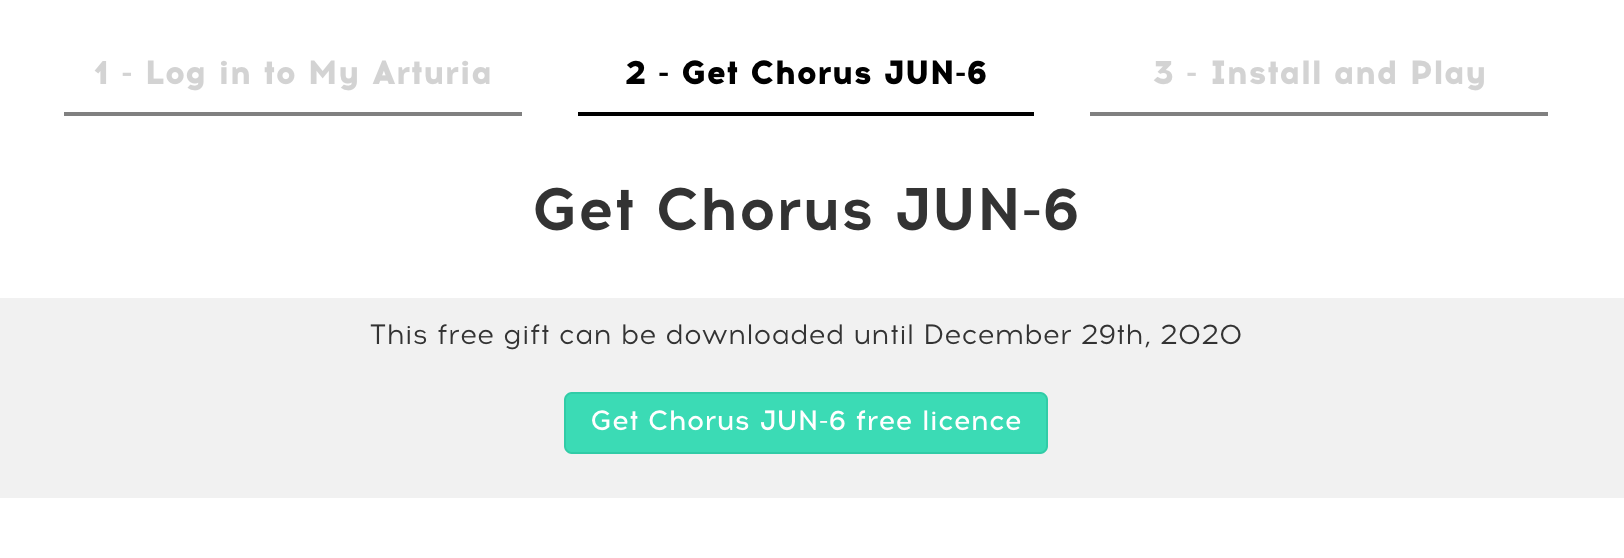 Arturia demande de licence pour le chorus Jun-6